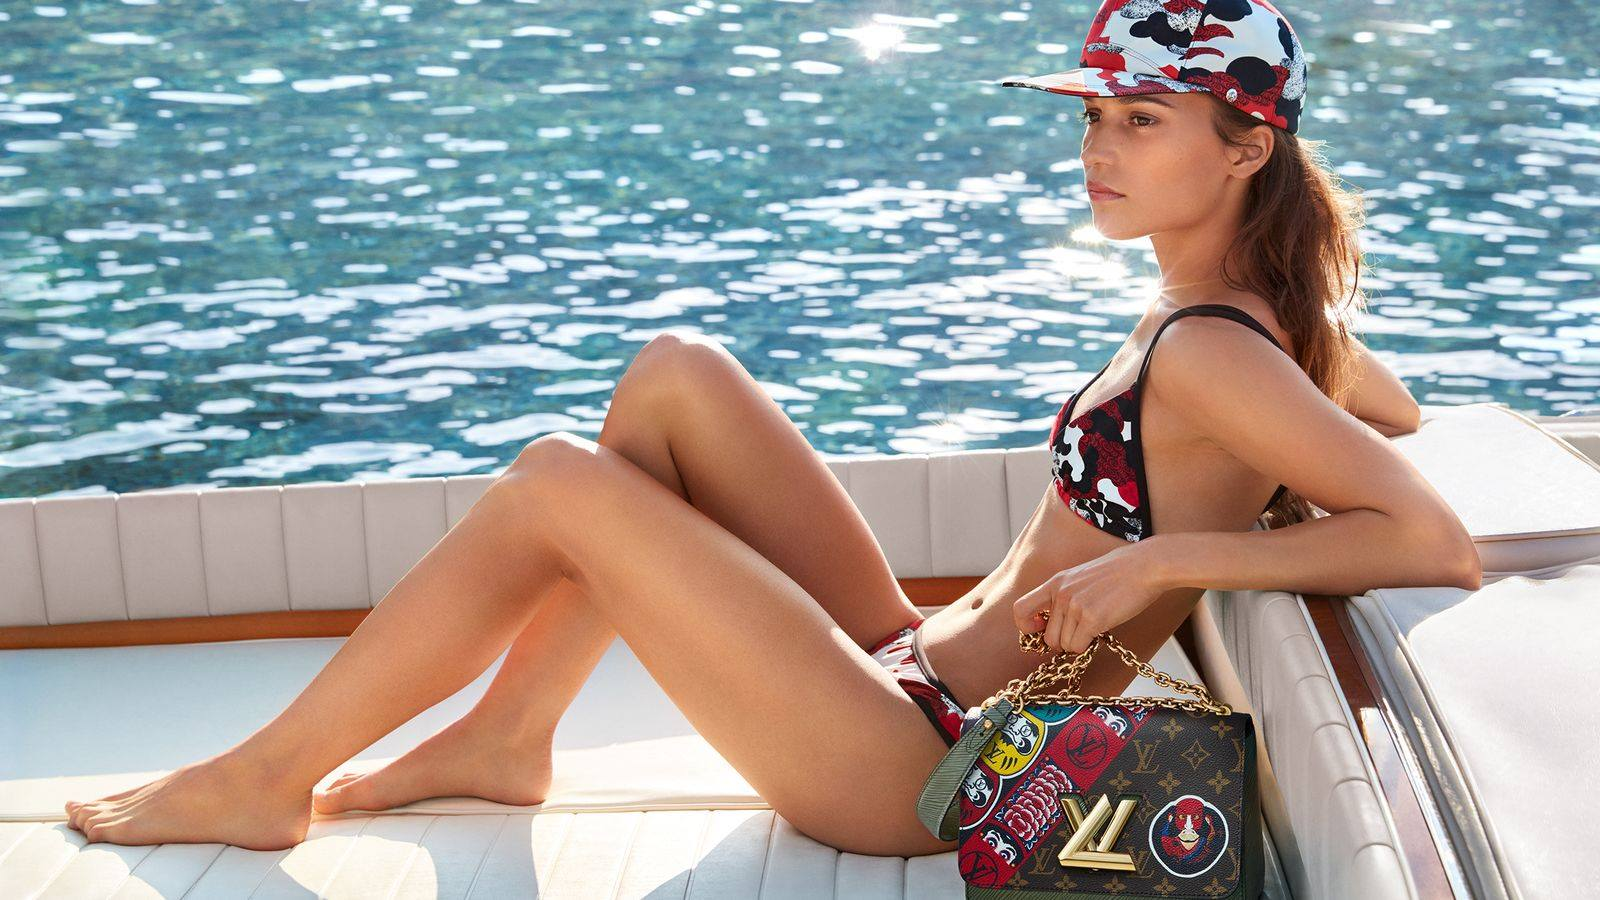 Louis Vuitton Cruise 2018 Campaign